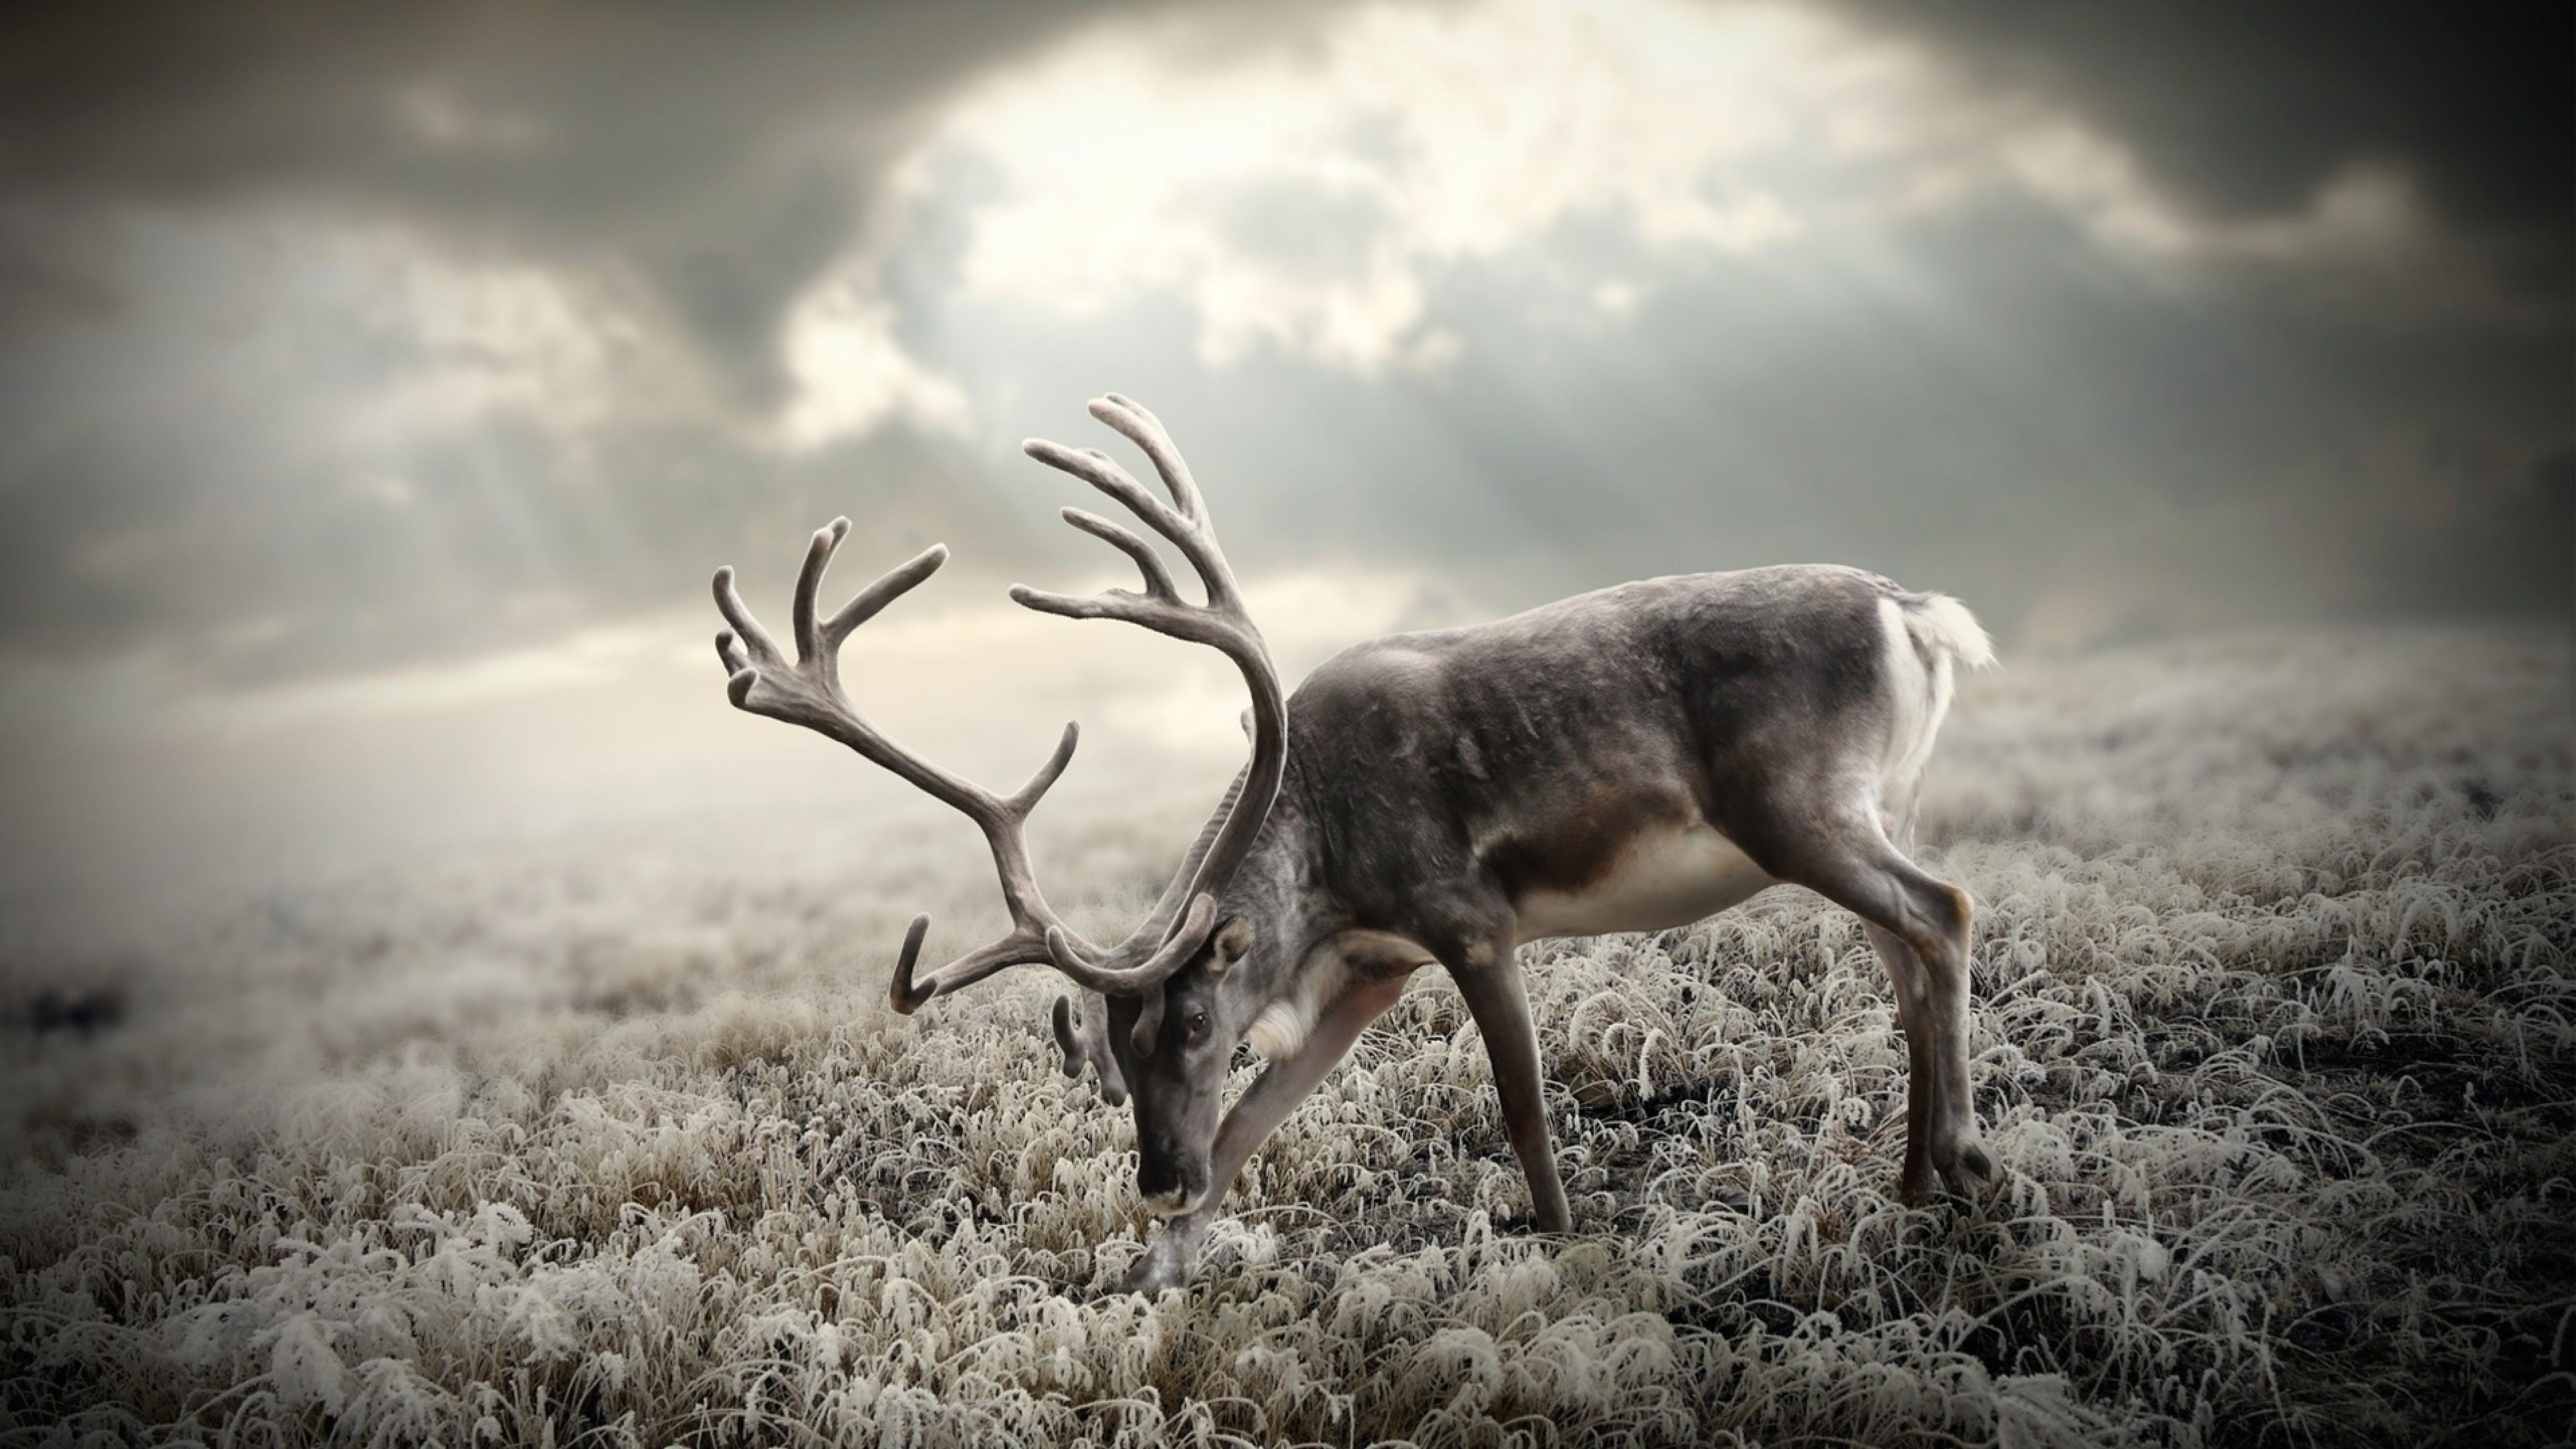 Wallpaper deer, nature, walking, black and white